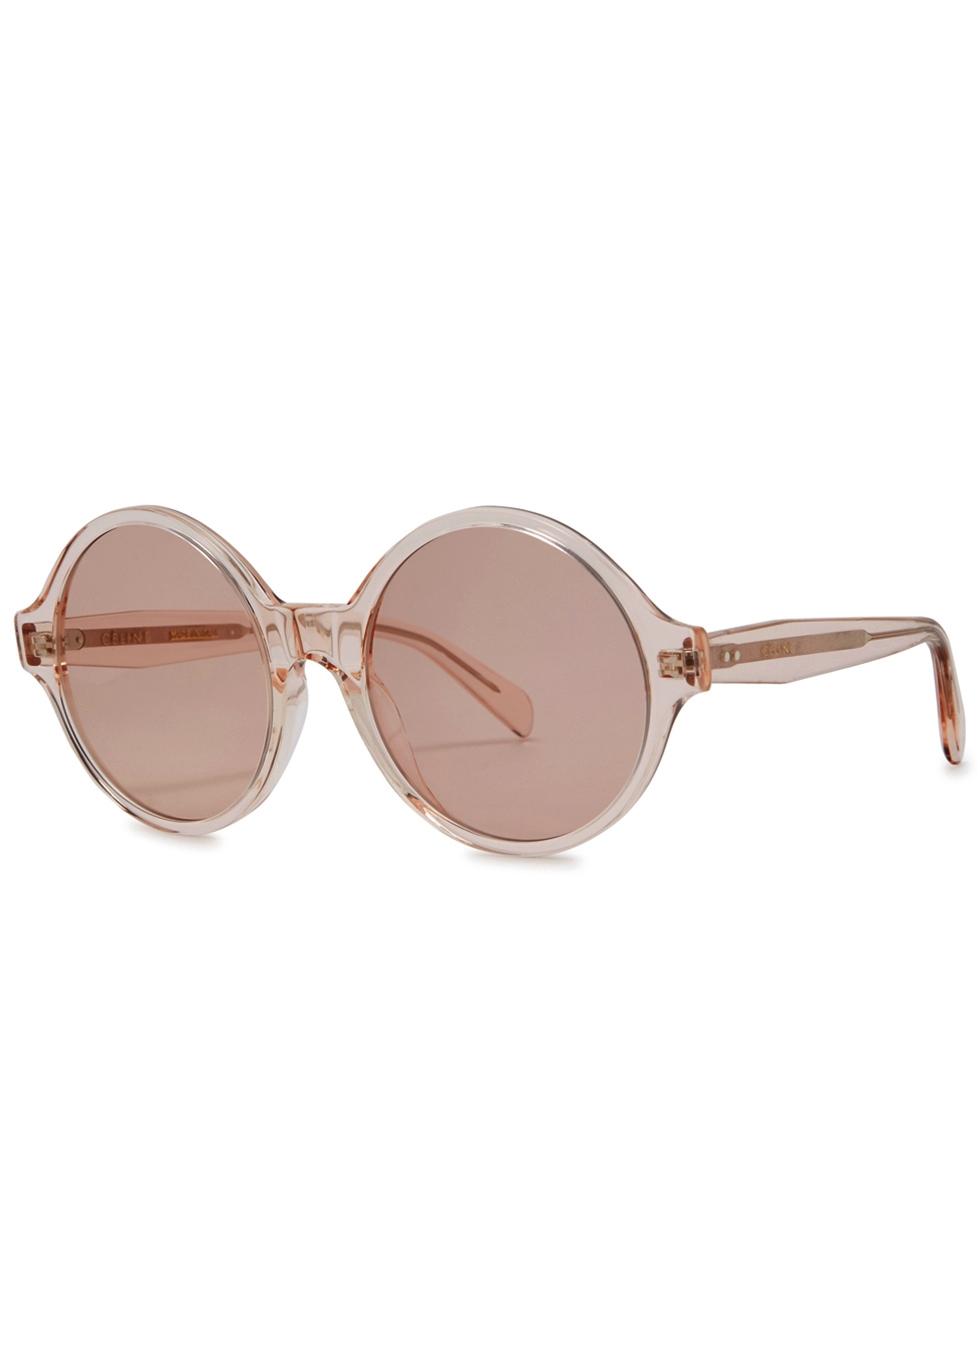 7ff9519b8f49 Women s Designer Round Sunglasses - Harvey Nichols